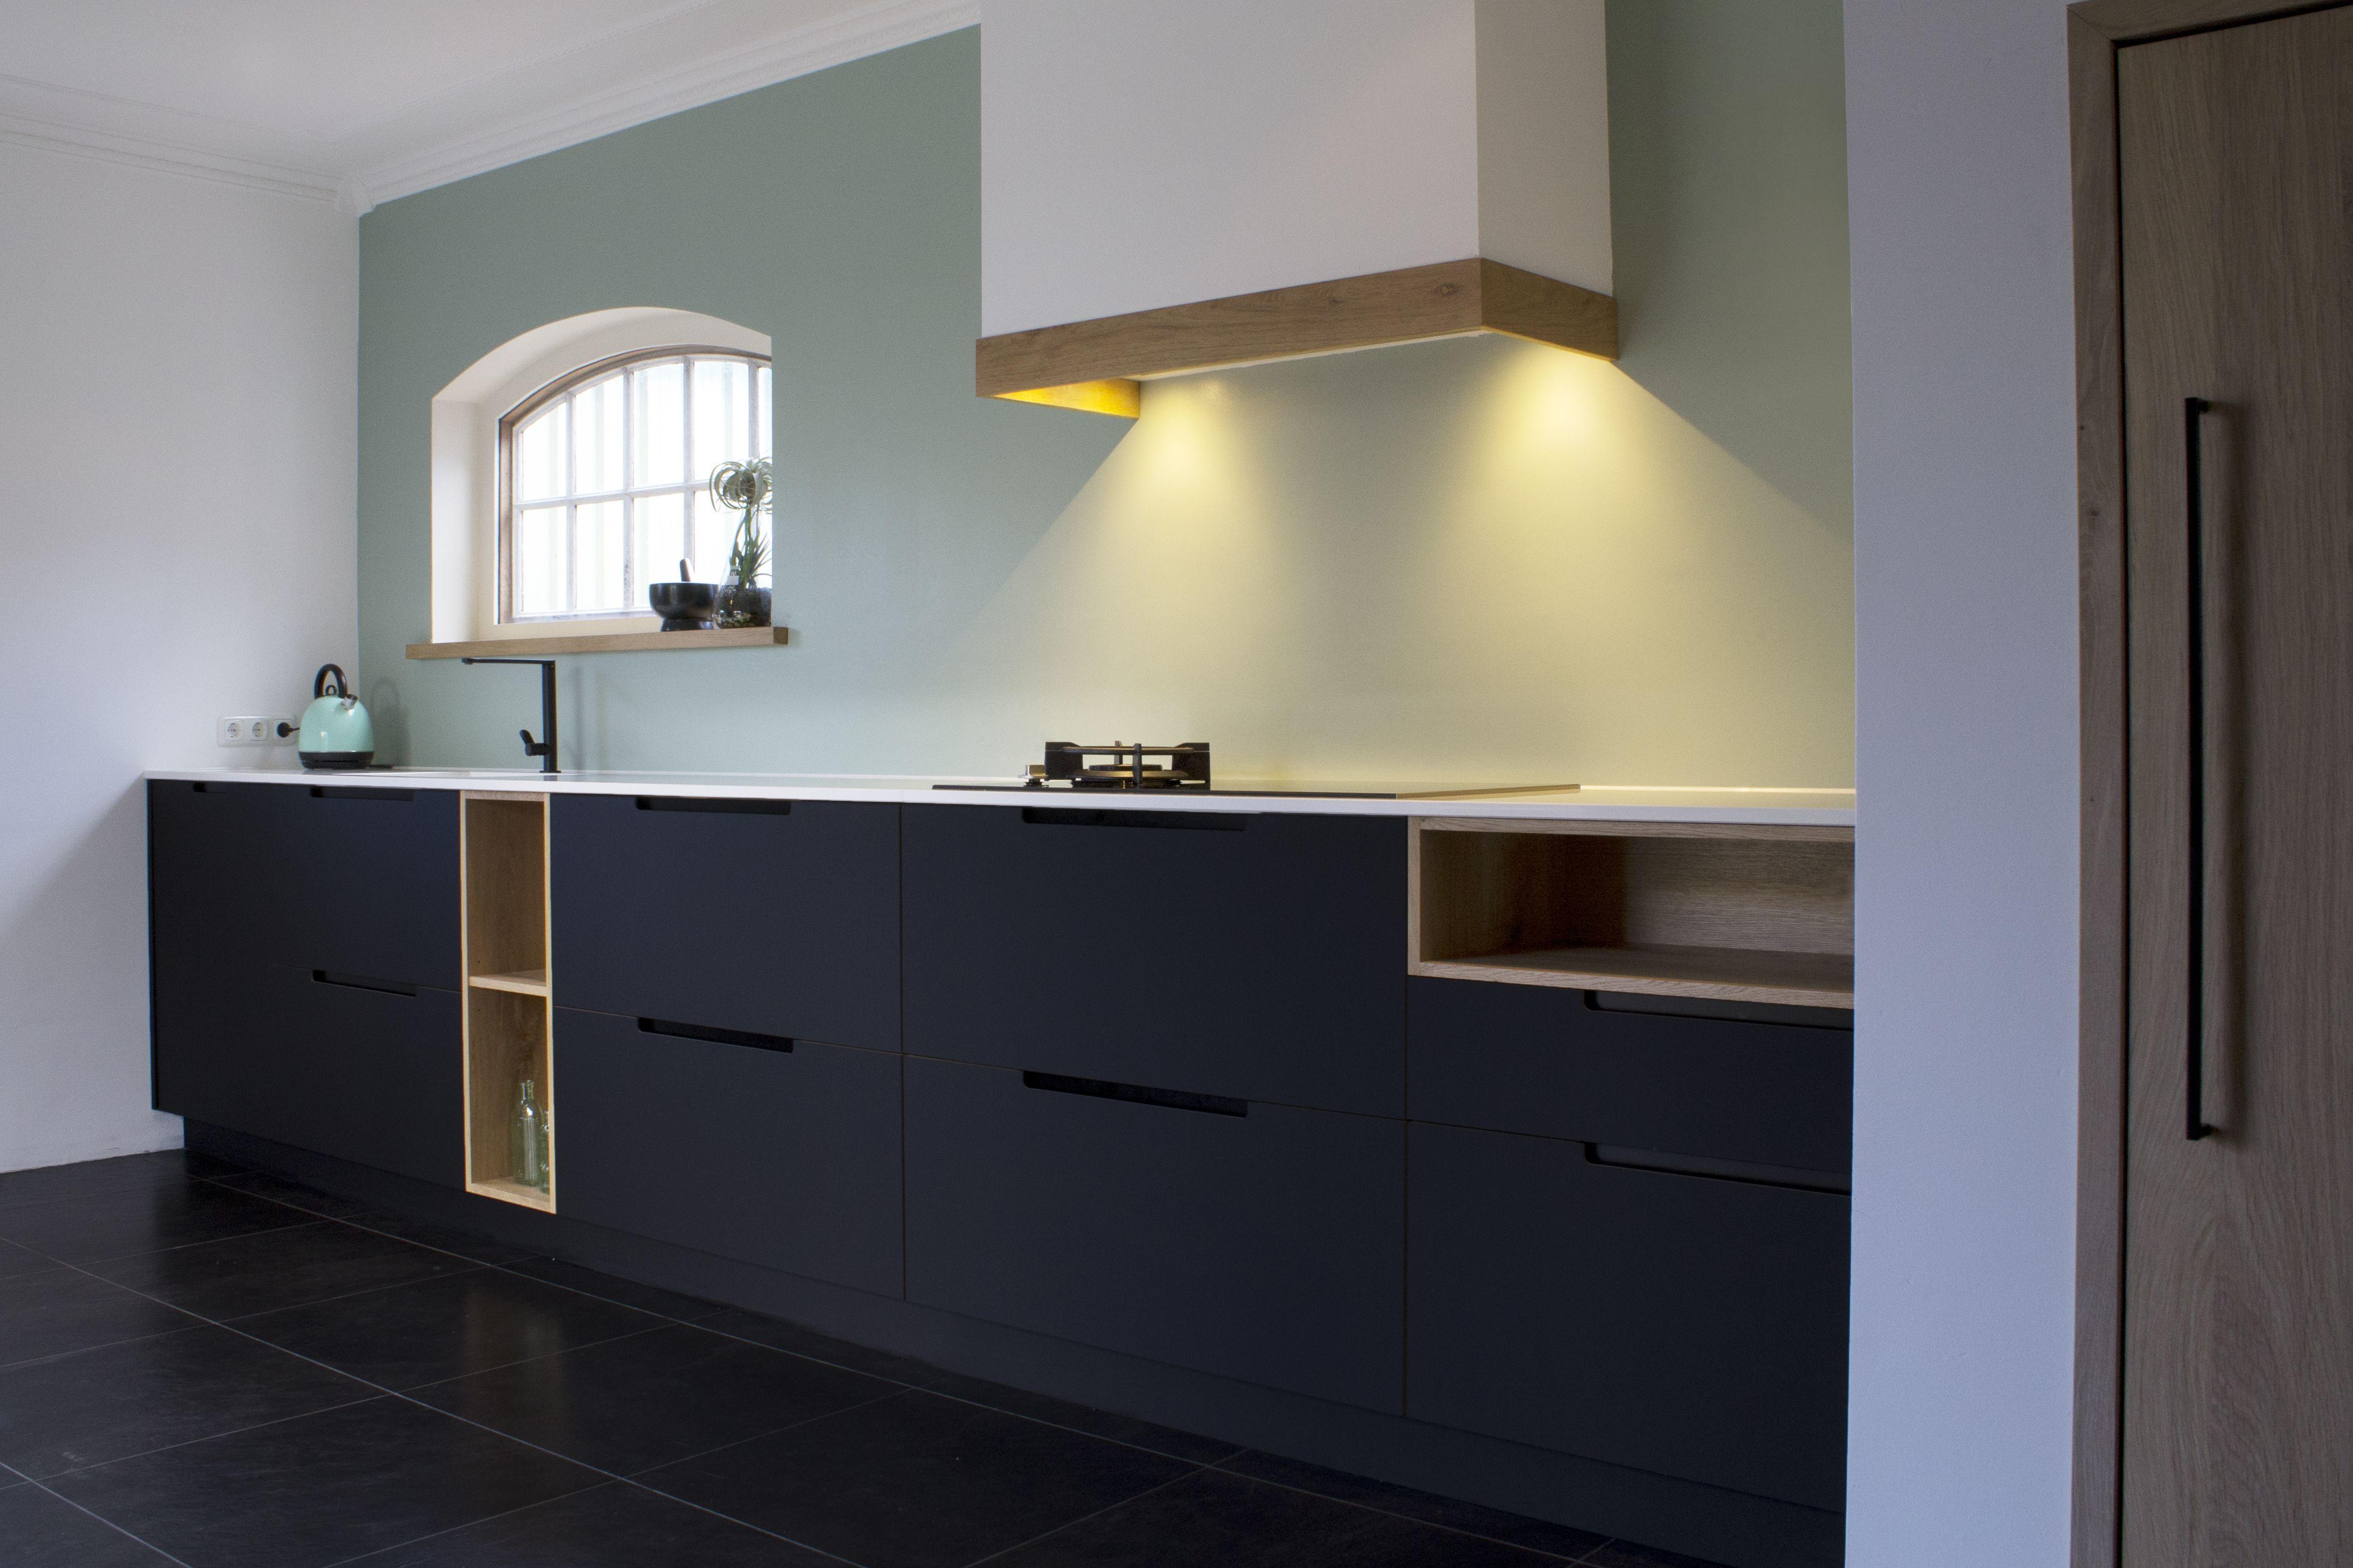 Keukentrend zwarte keukens keller keukens